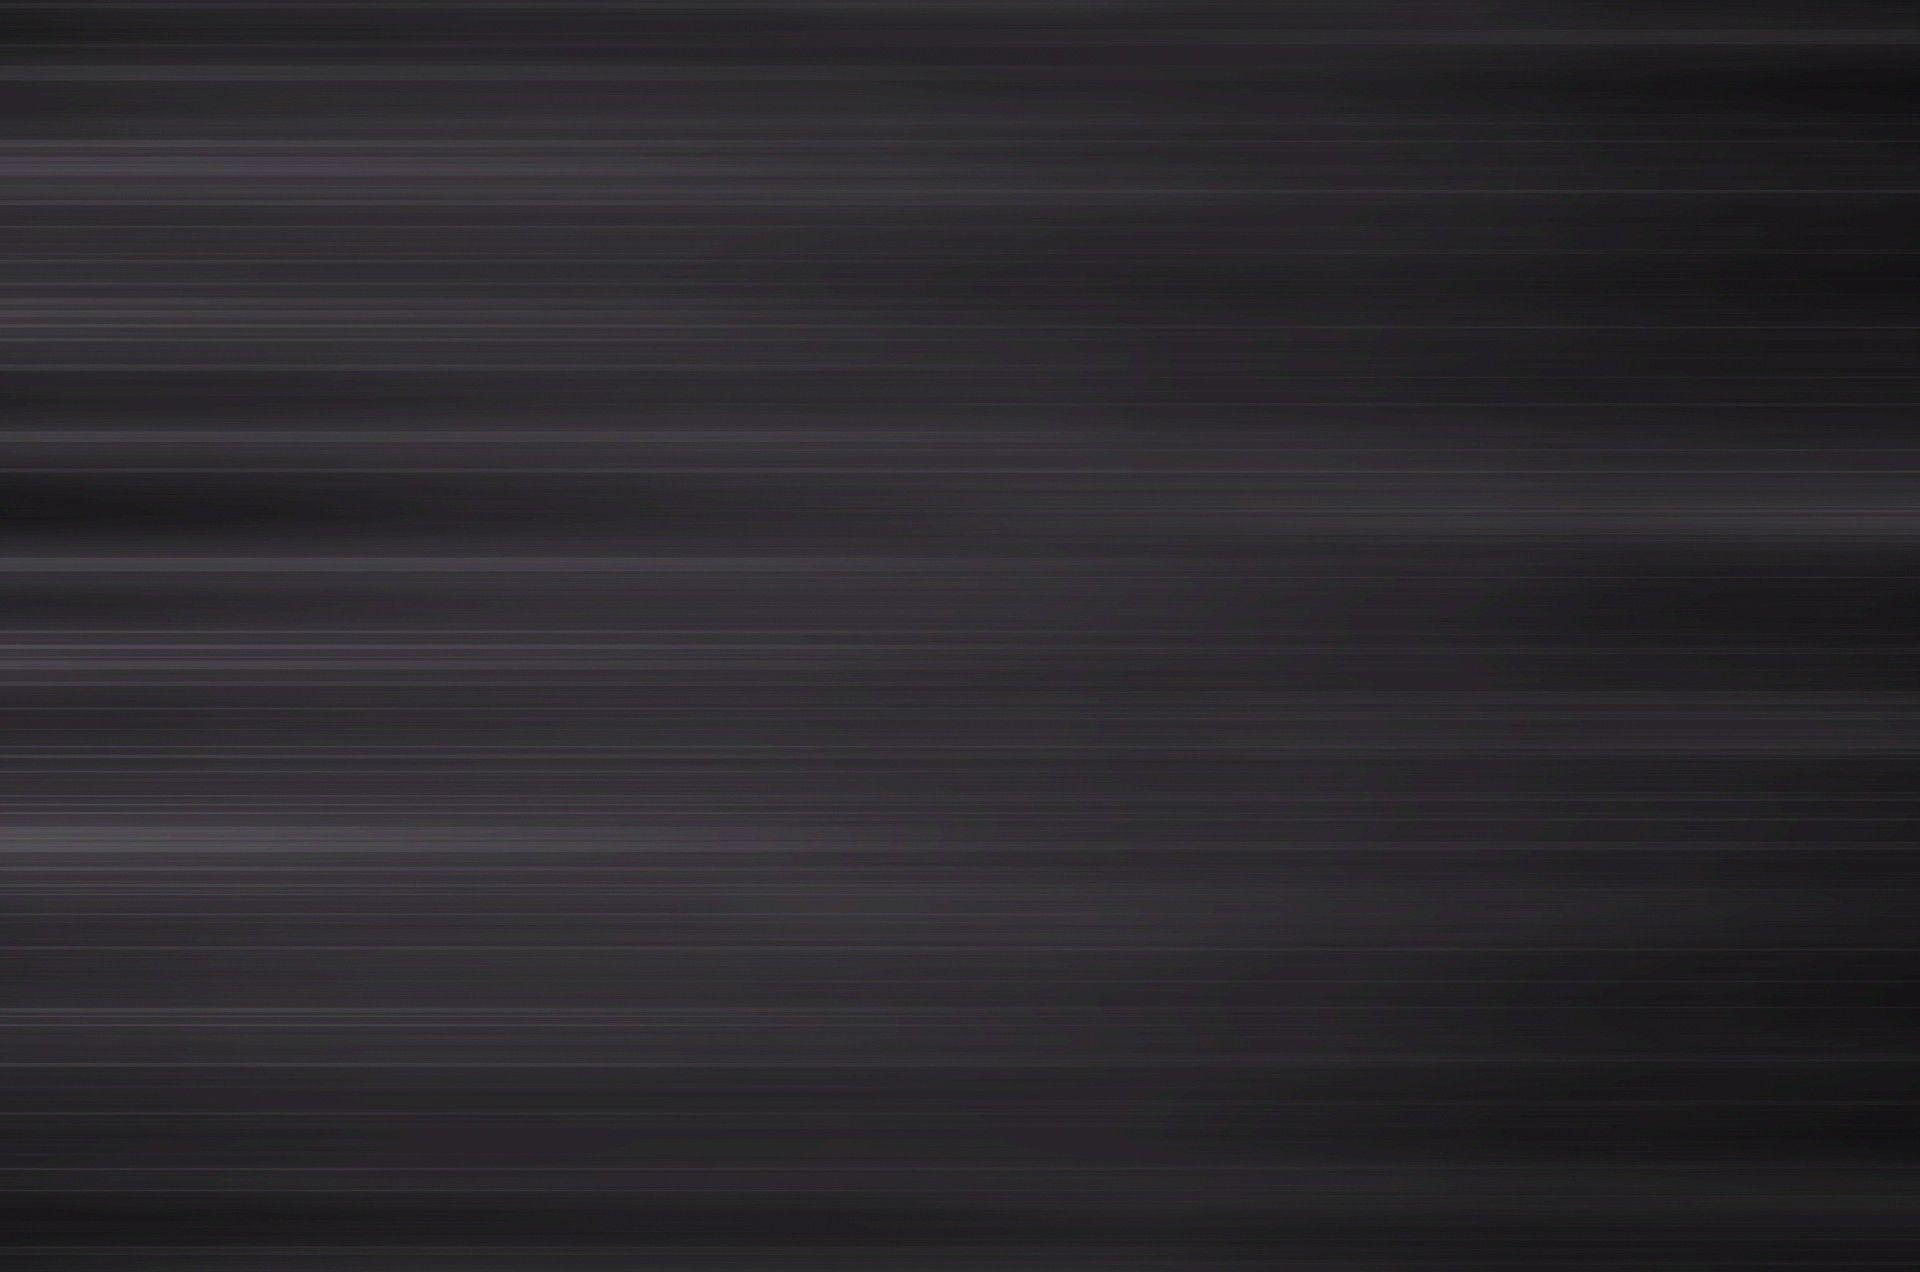 Dark Gray Backgrounds Texture - Wallpaper Cave